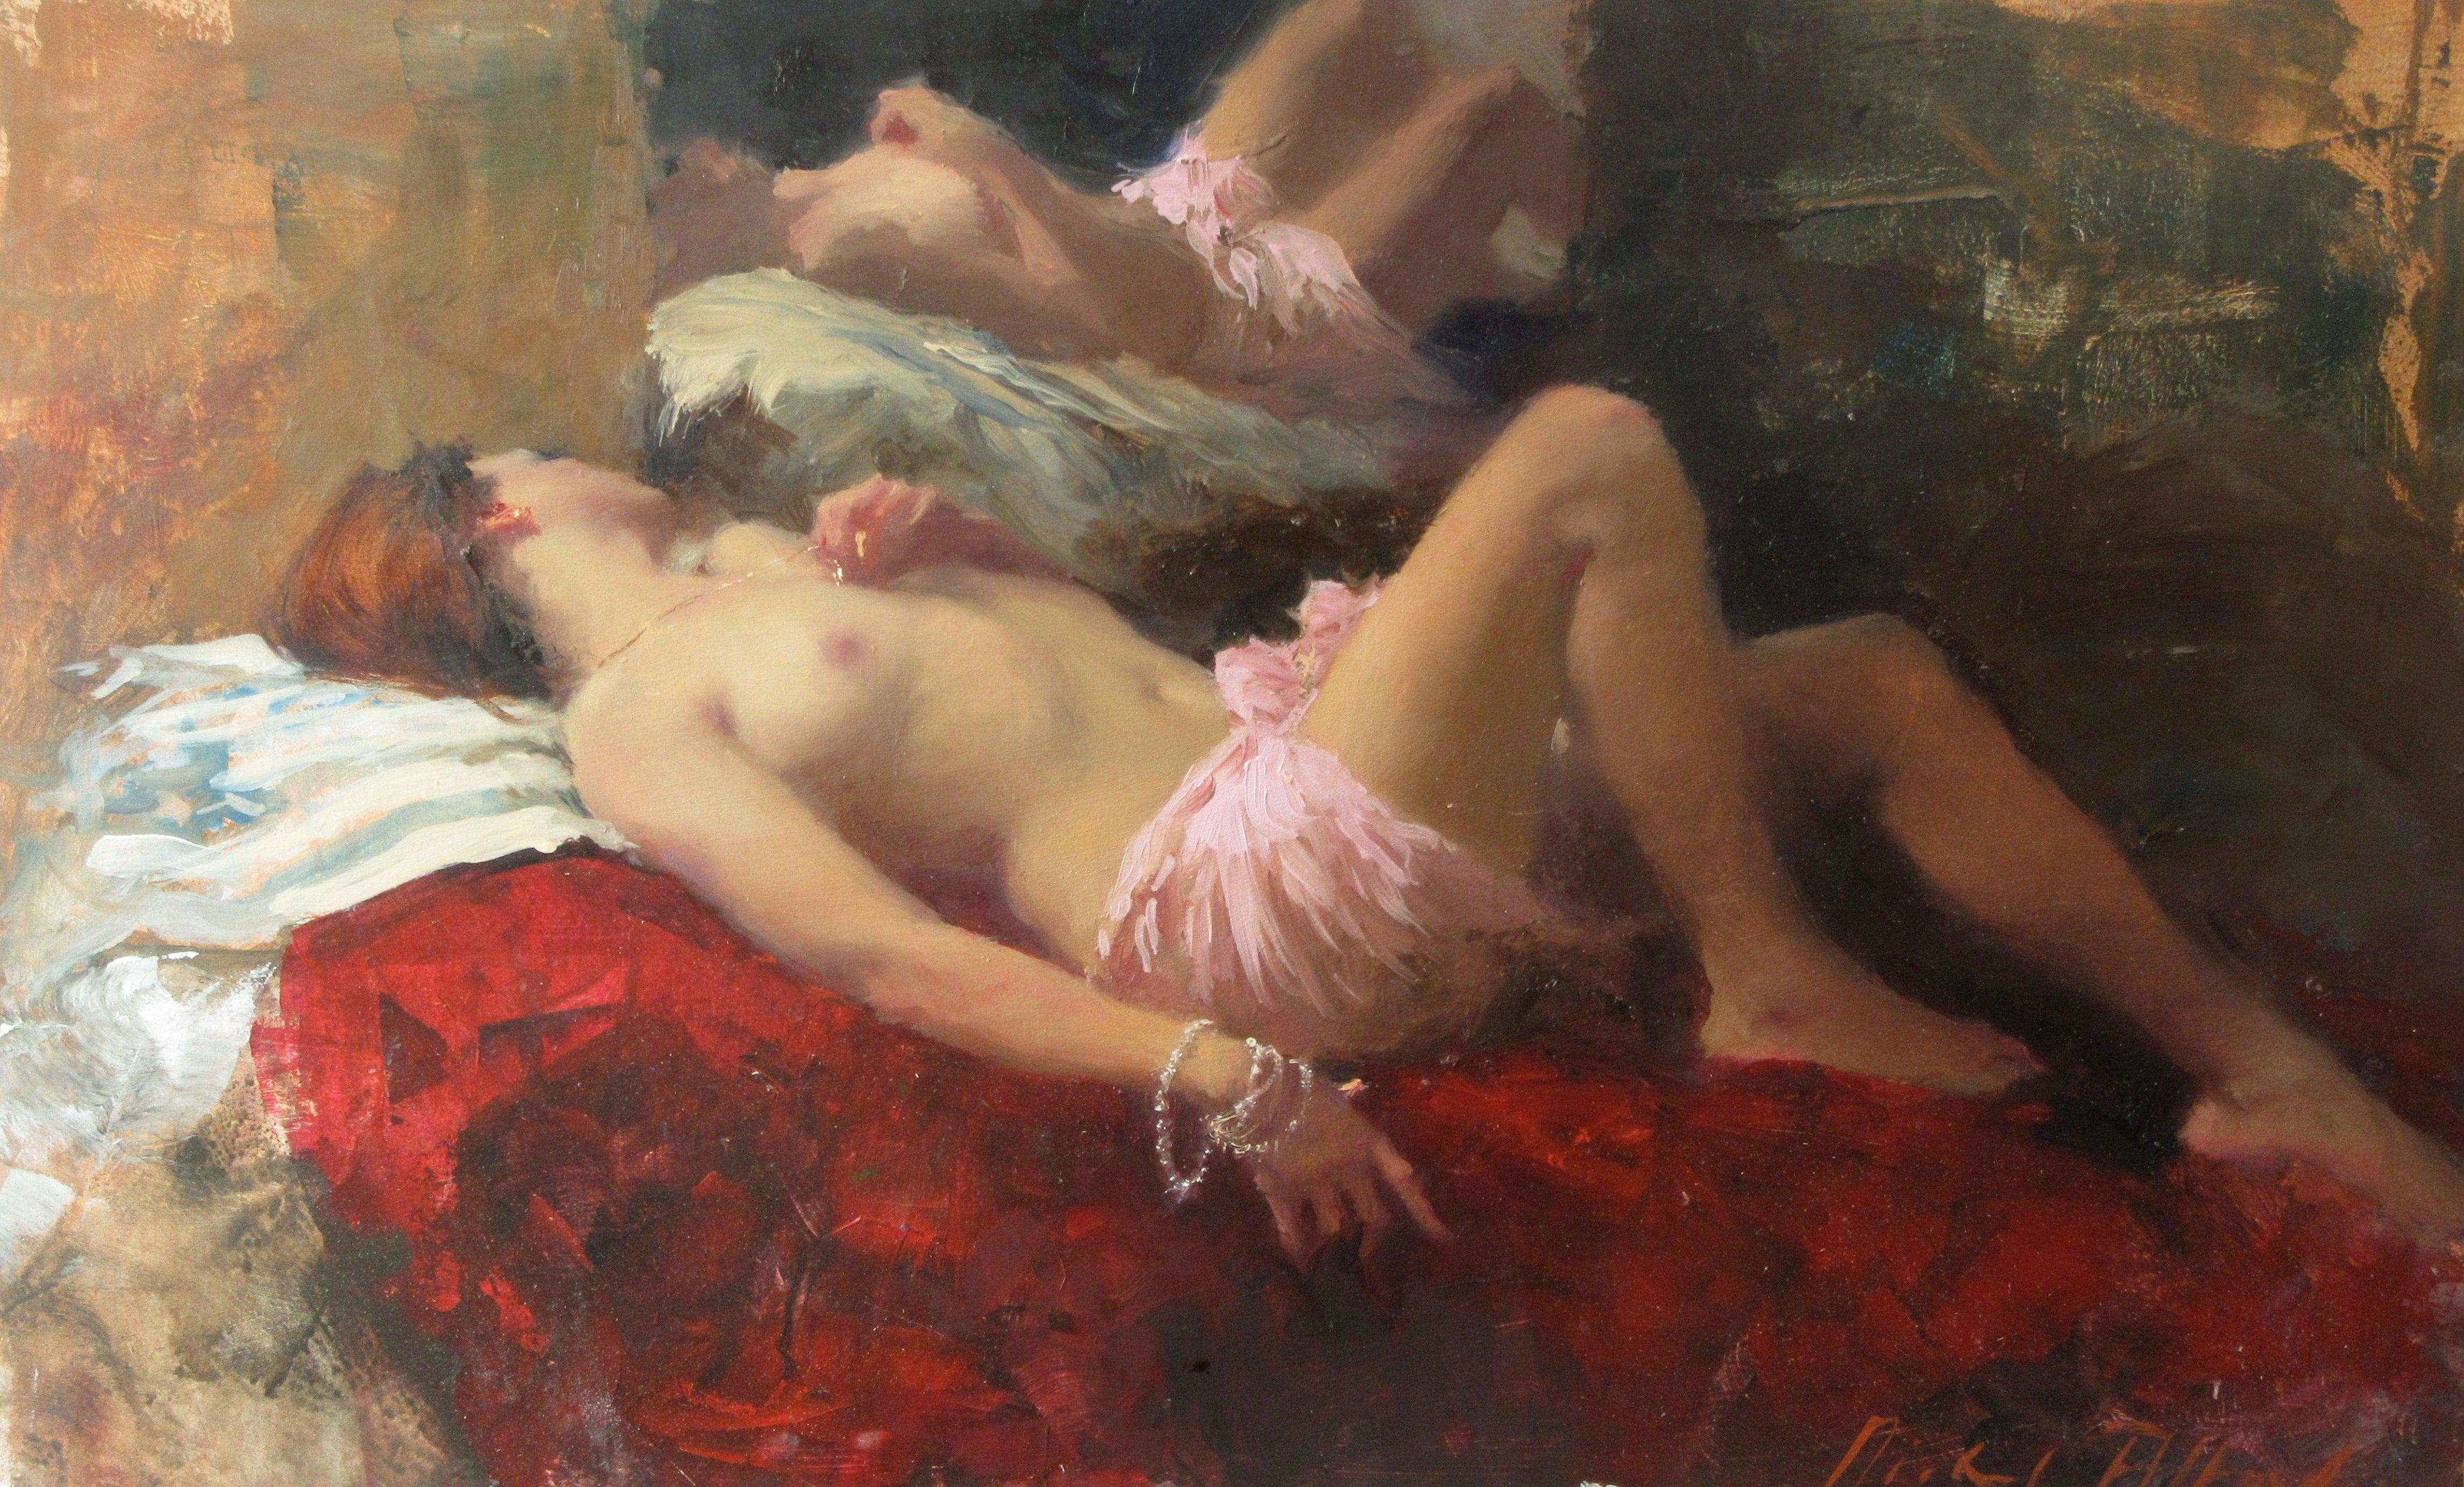 Sleeping Nude, Rose & Crimson - modern figurative painting Contemporary Art